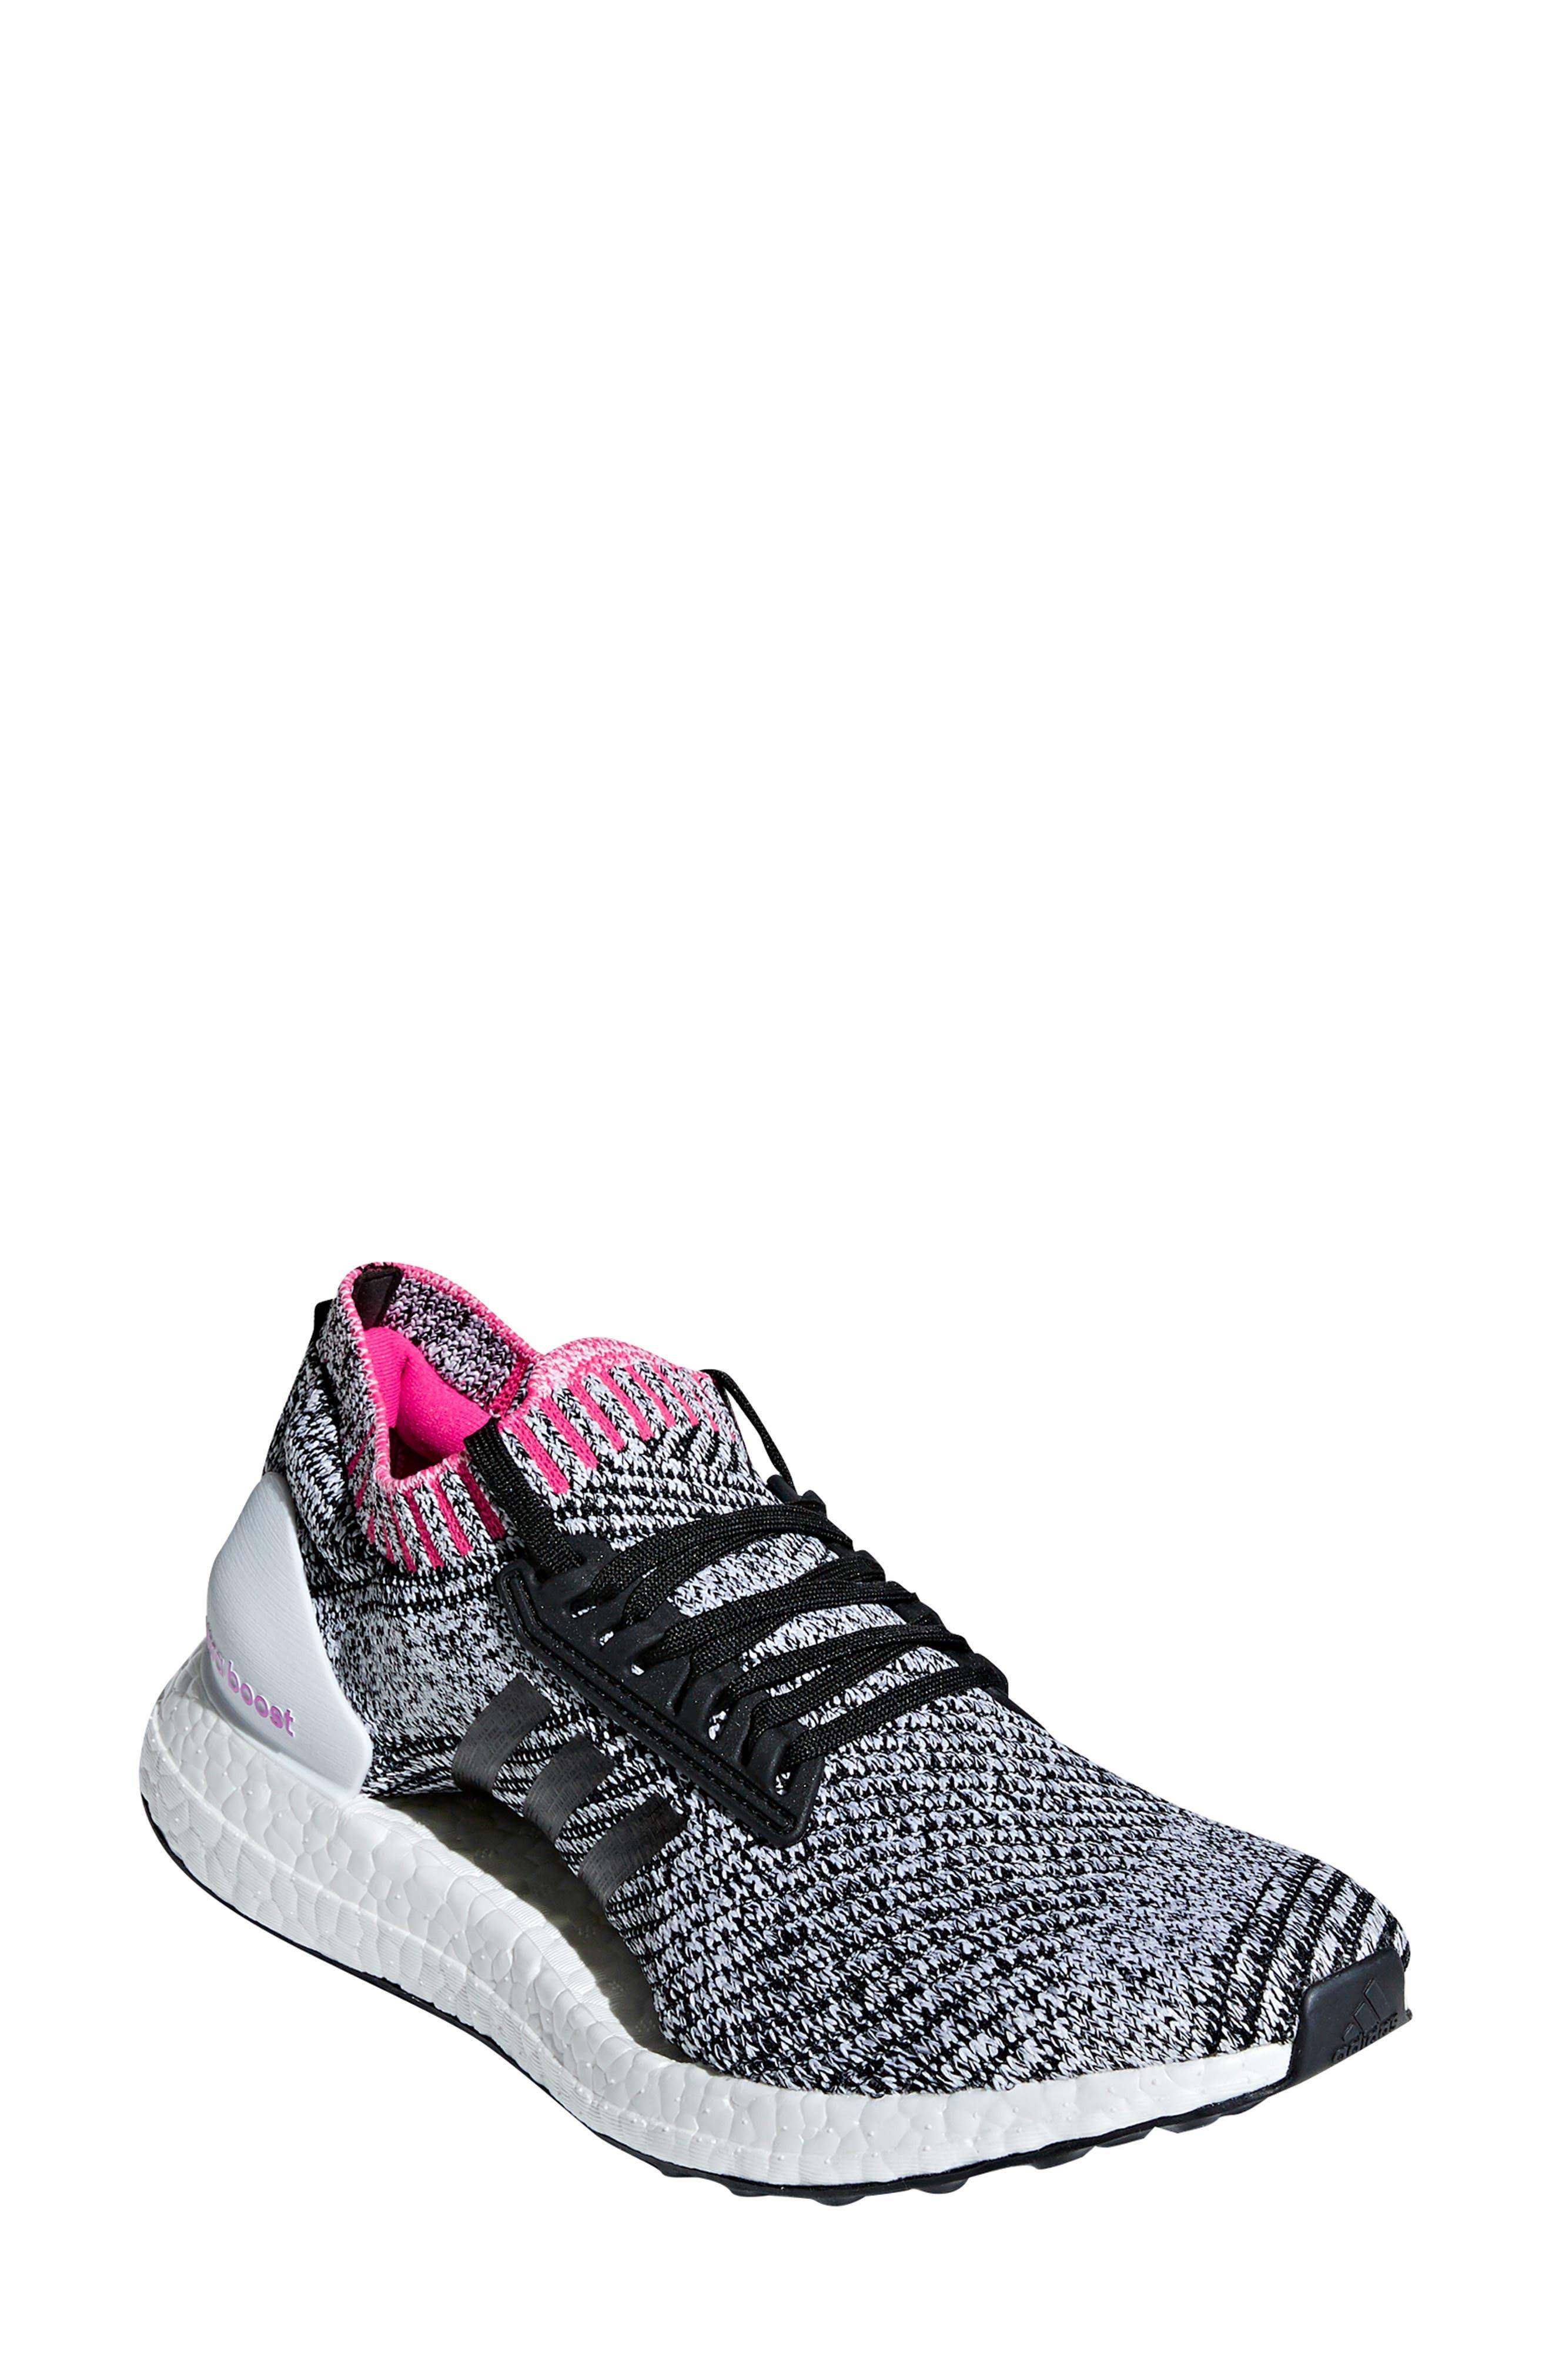 UltraBoost X Running Shoe,                         Main,                         color, WHITE/ BLACK/ SHOCK PINK